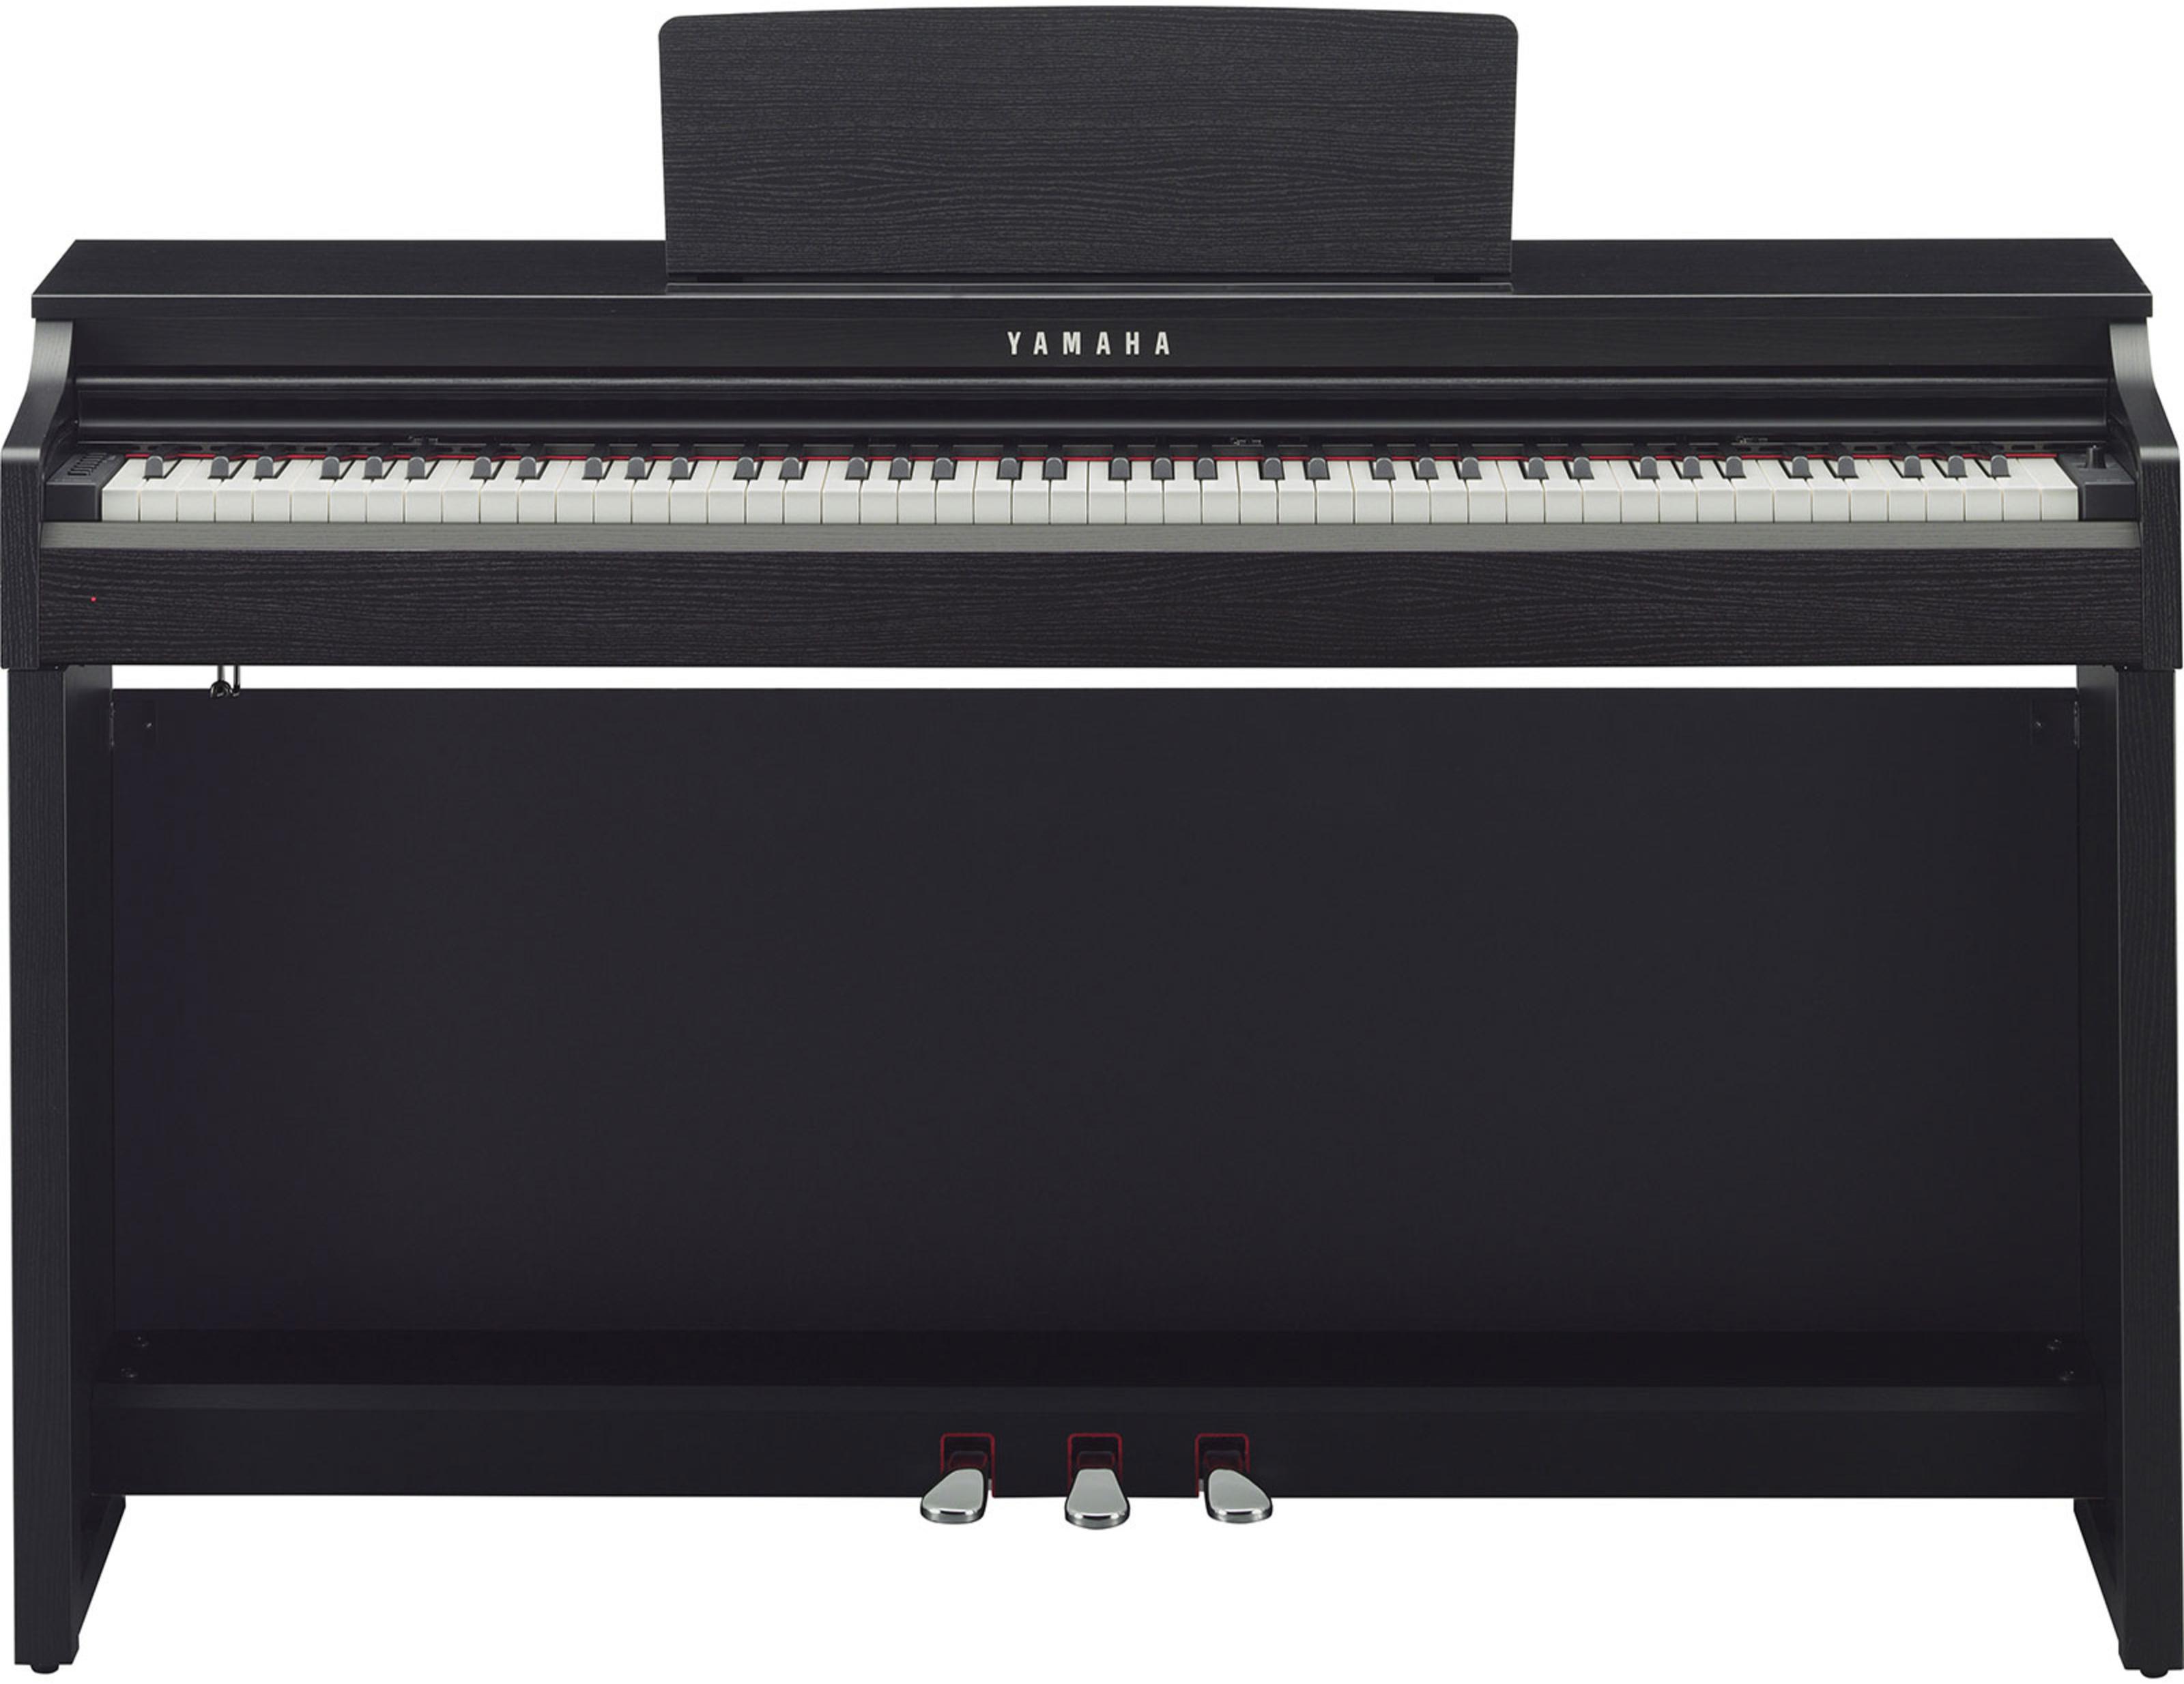 yamaha clavinova clp 525 b digitalpiano schwarz. Black Bedroom Furniture Sets. Home Design Ideas